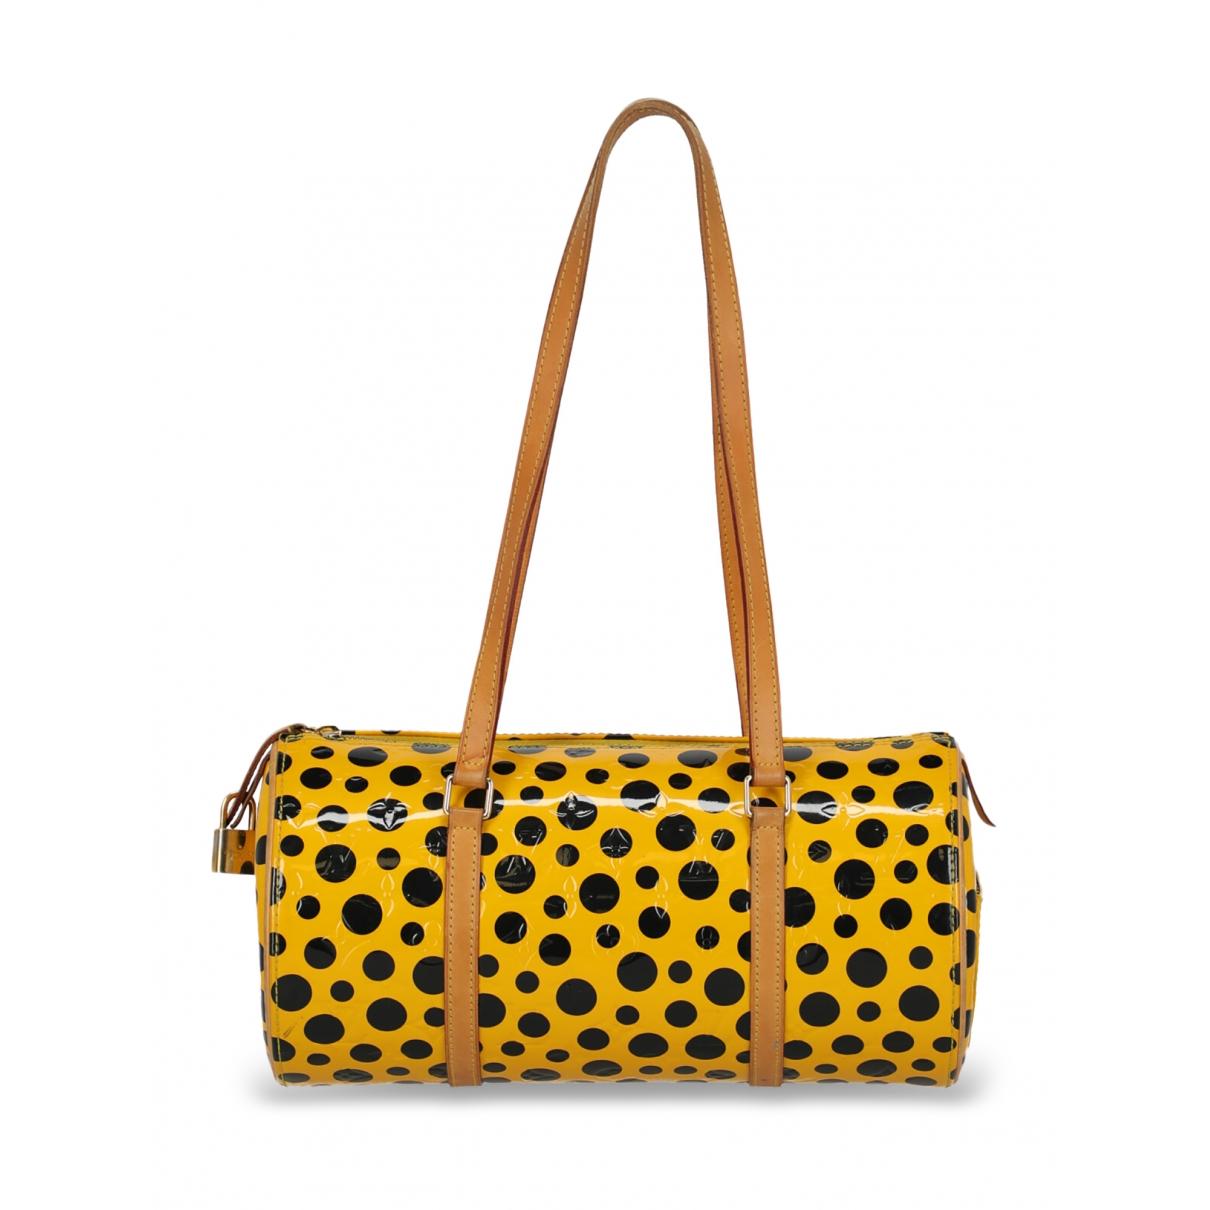 Louis Vuitton Bedford Yellow Patent leather handbag for Women \N